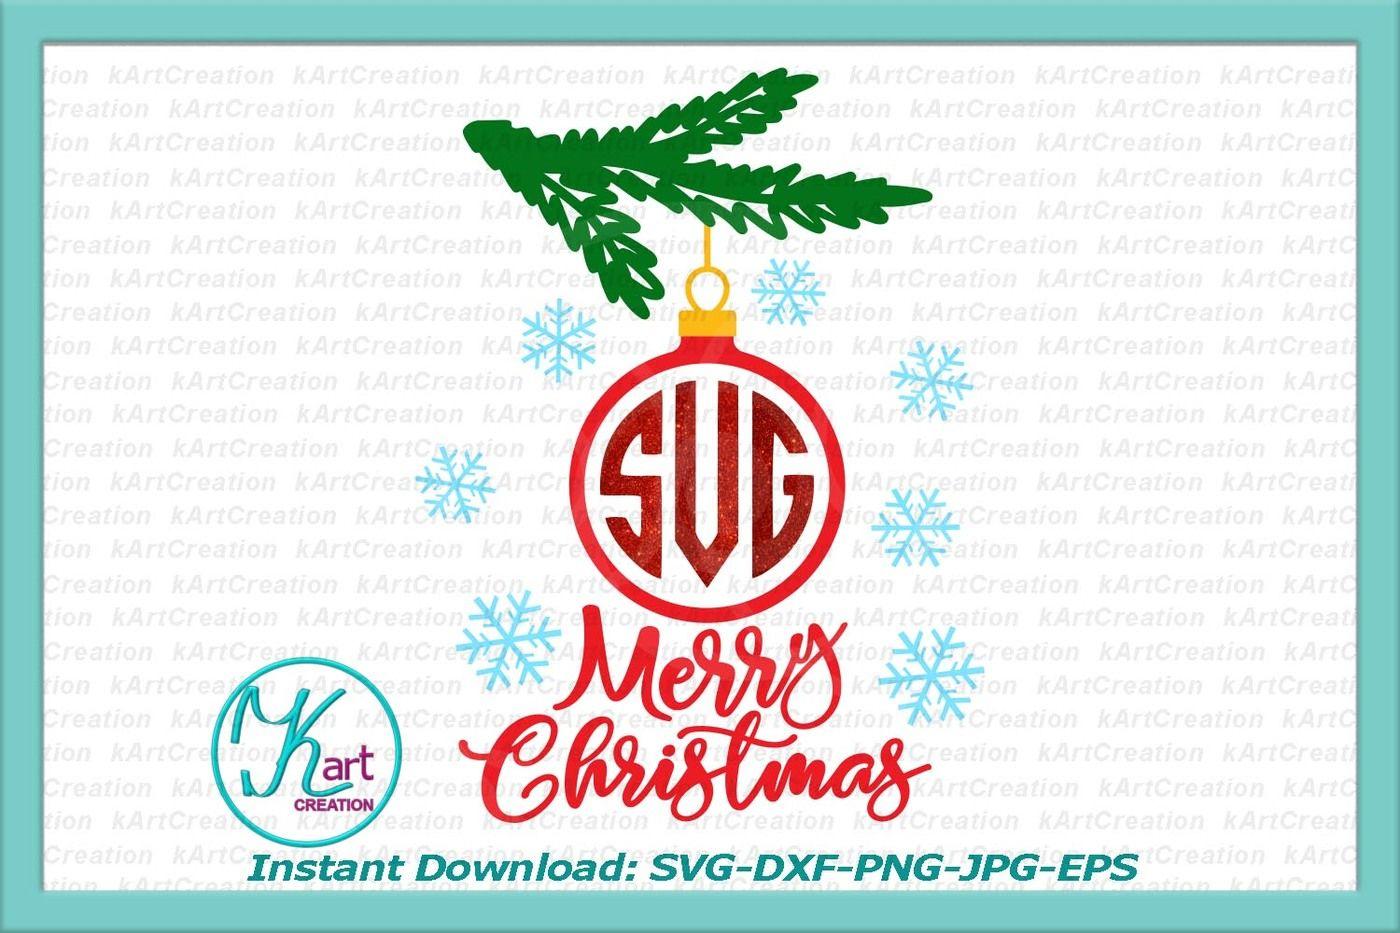 Merry Christmas Ornament Svg.Christmas Monogram Svg Christmas Ornament Monogram Svg